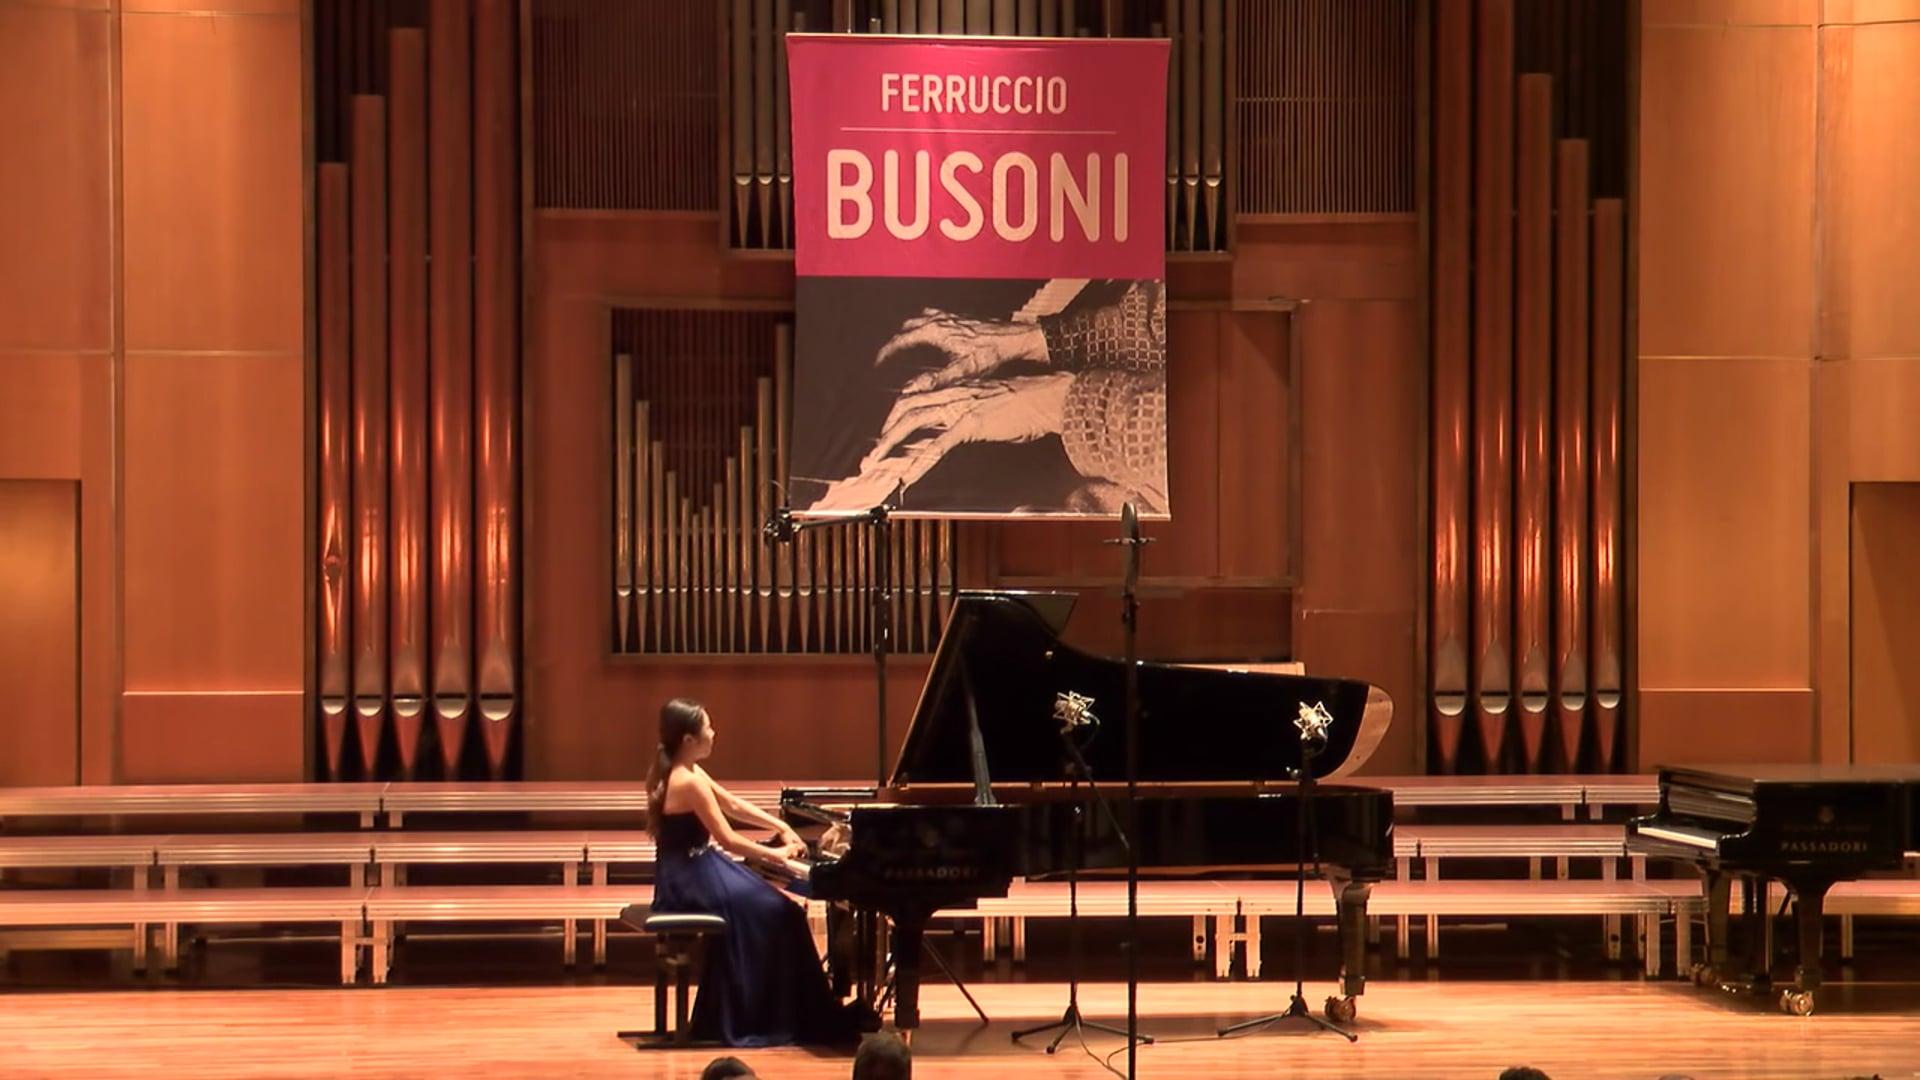 Chloe (Ji-Yeong) Mun - Solo Finals - 60th F. Busoni International Piano Competition - © Busoni International Piano Competition